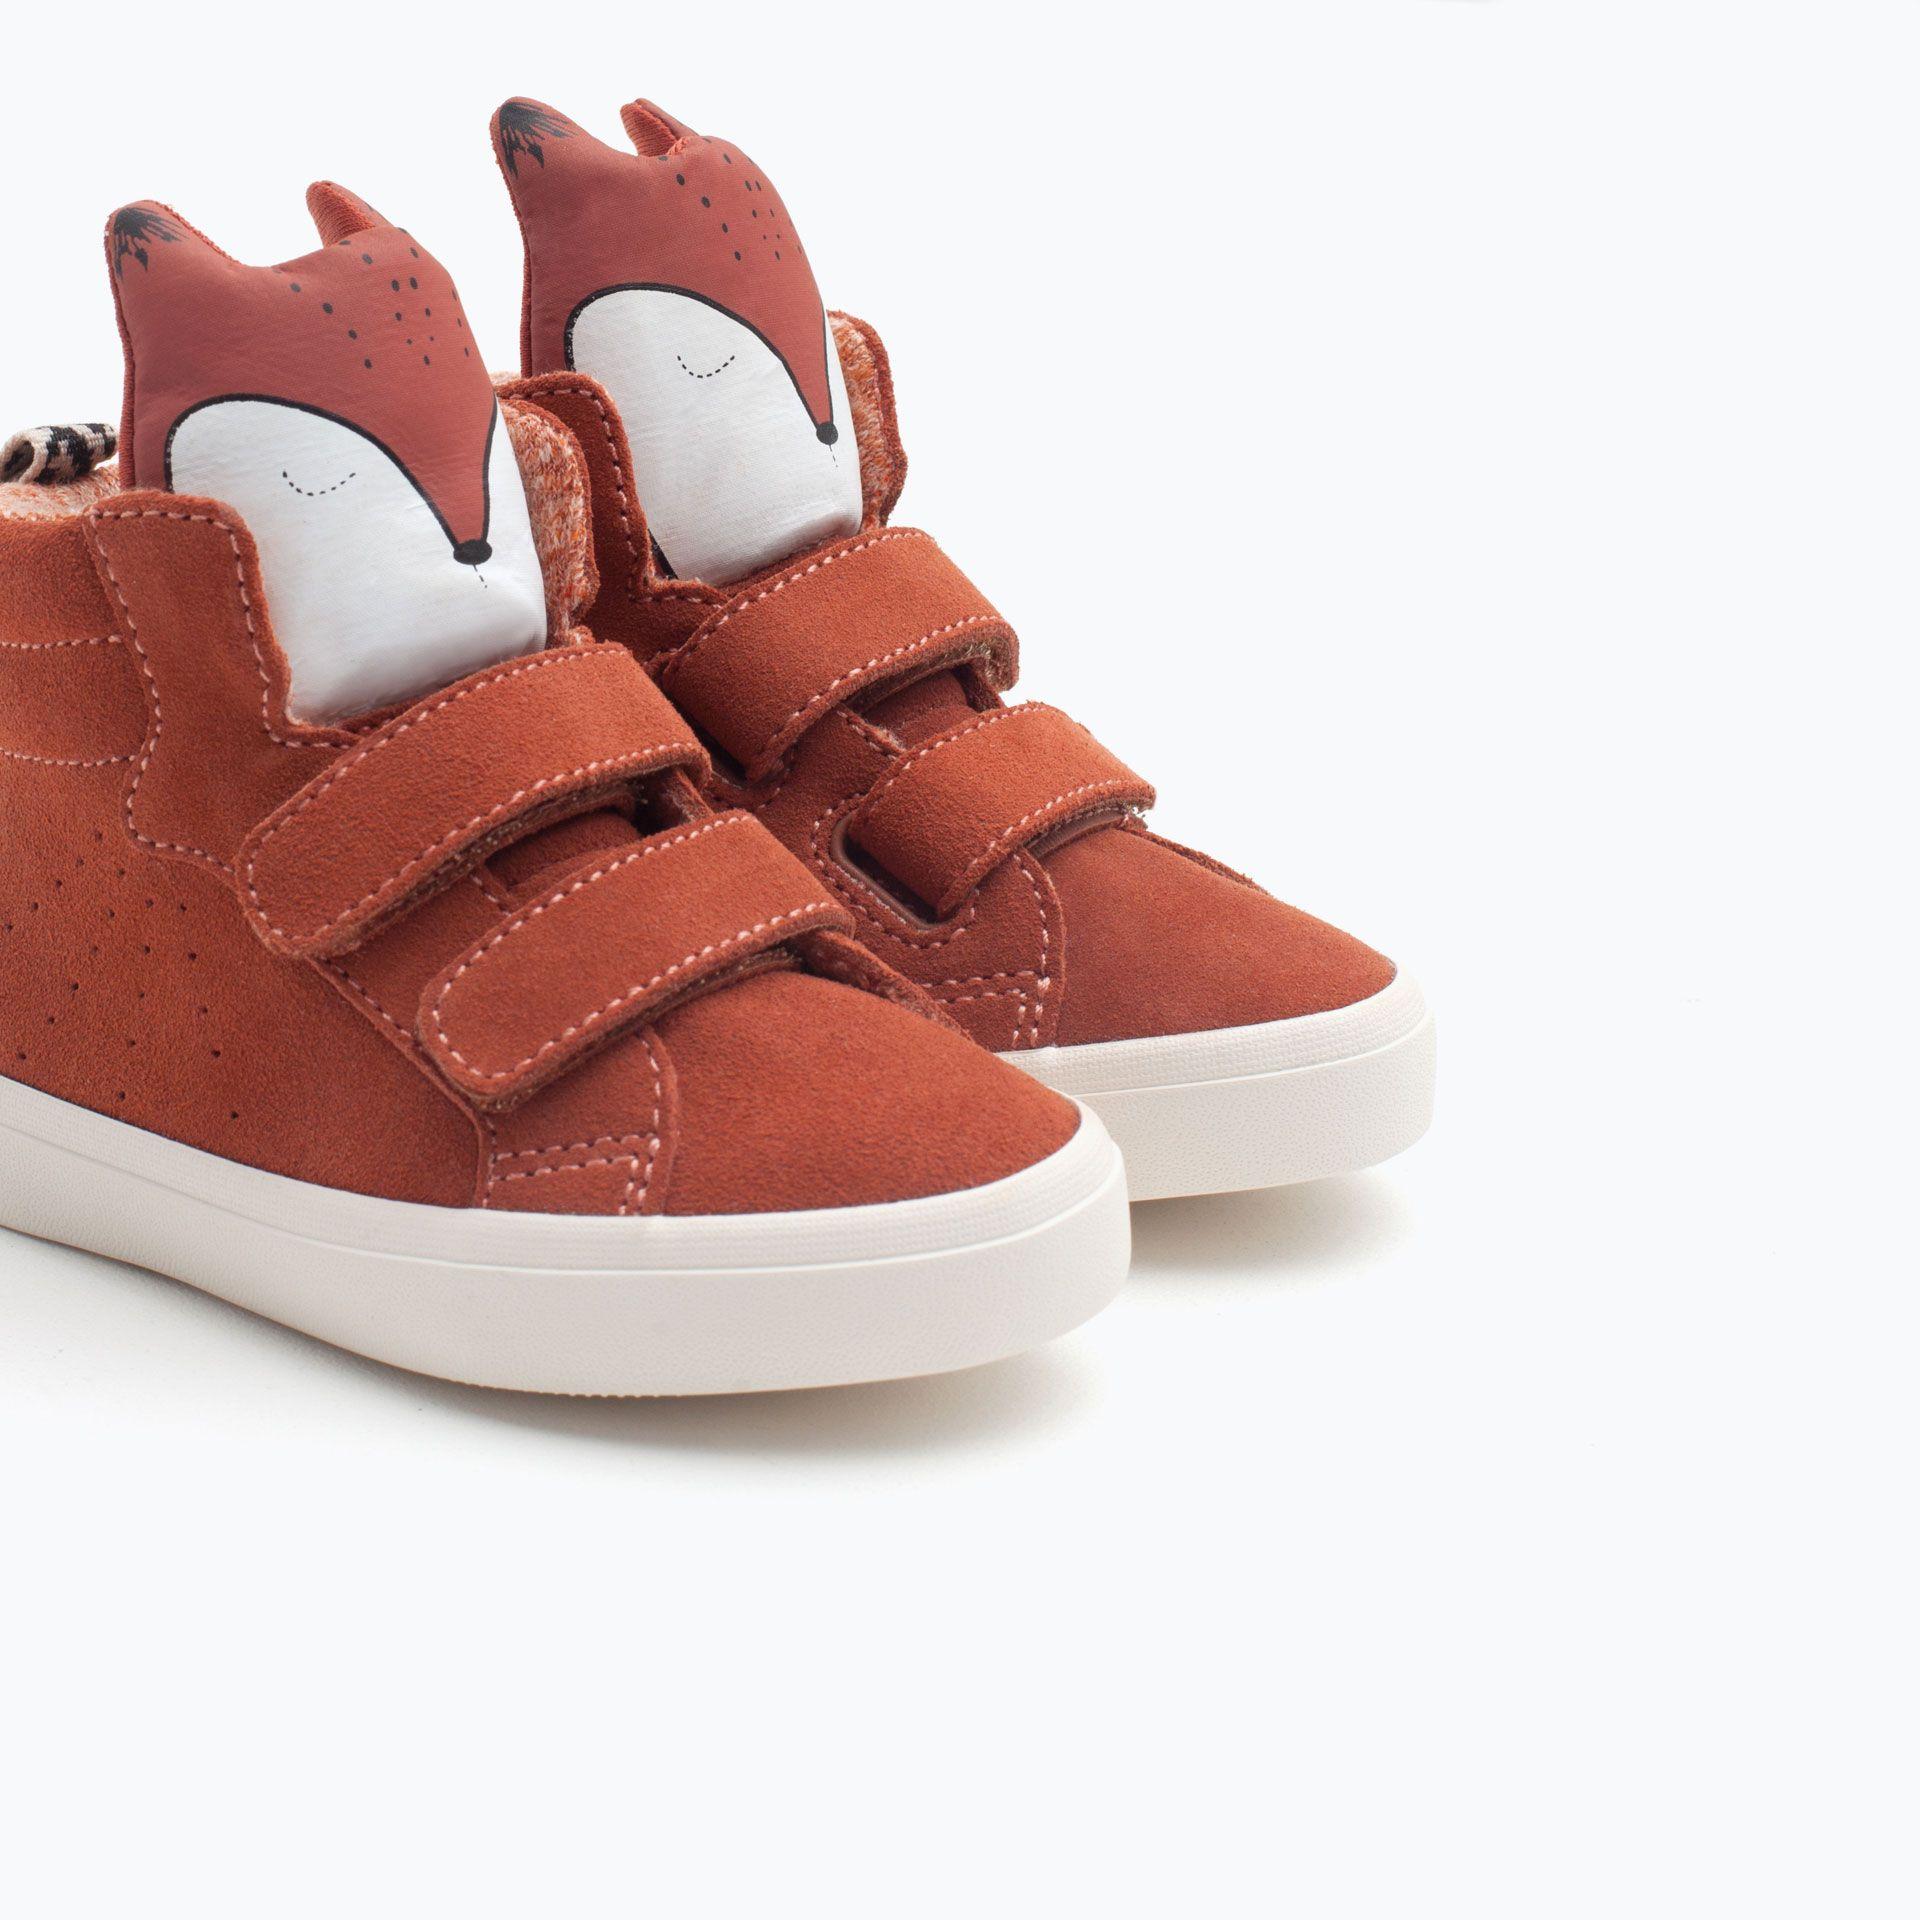 BASKET PIEL DETALLE ZORRO Zapatos Bebé ni±o